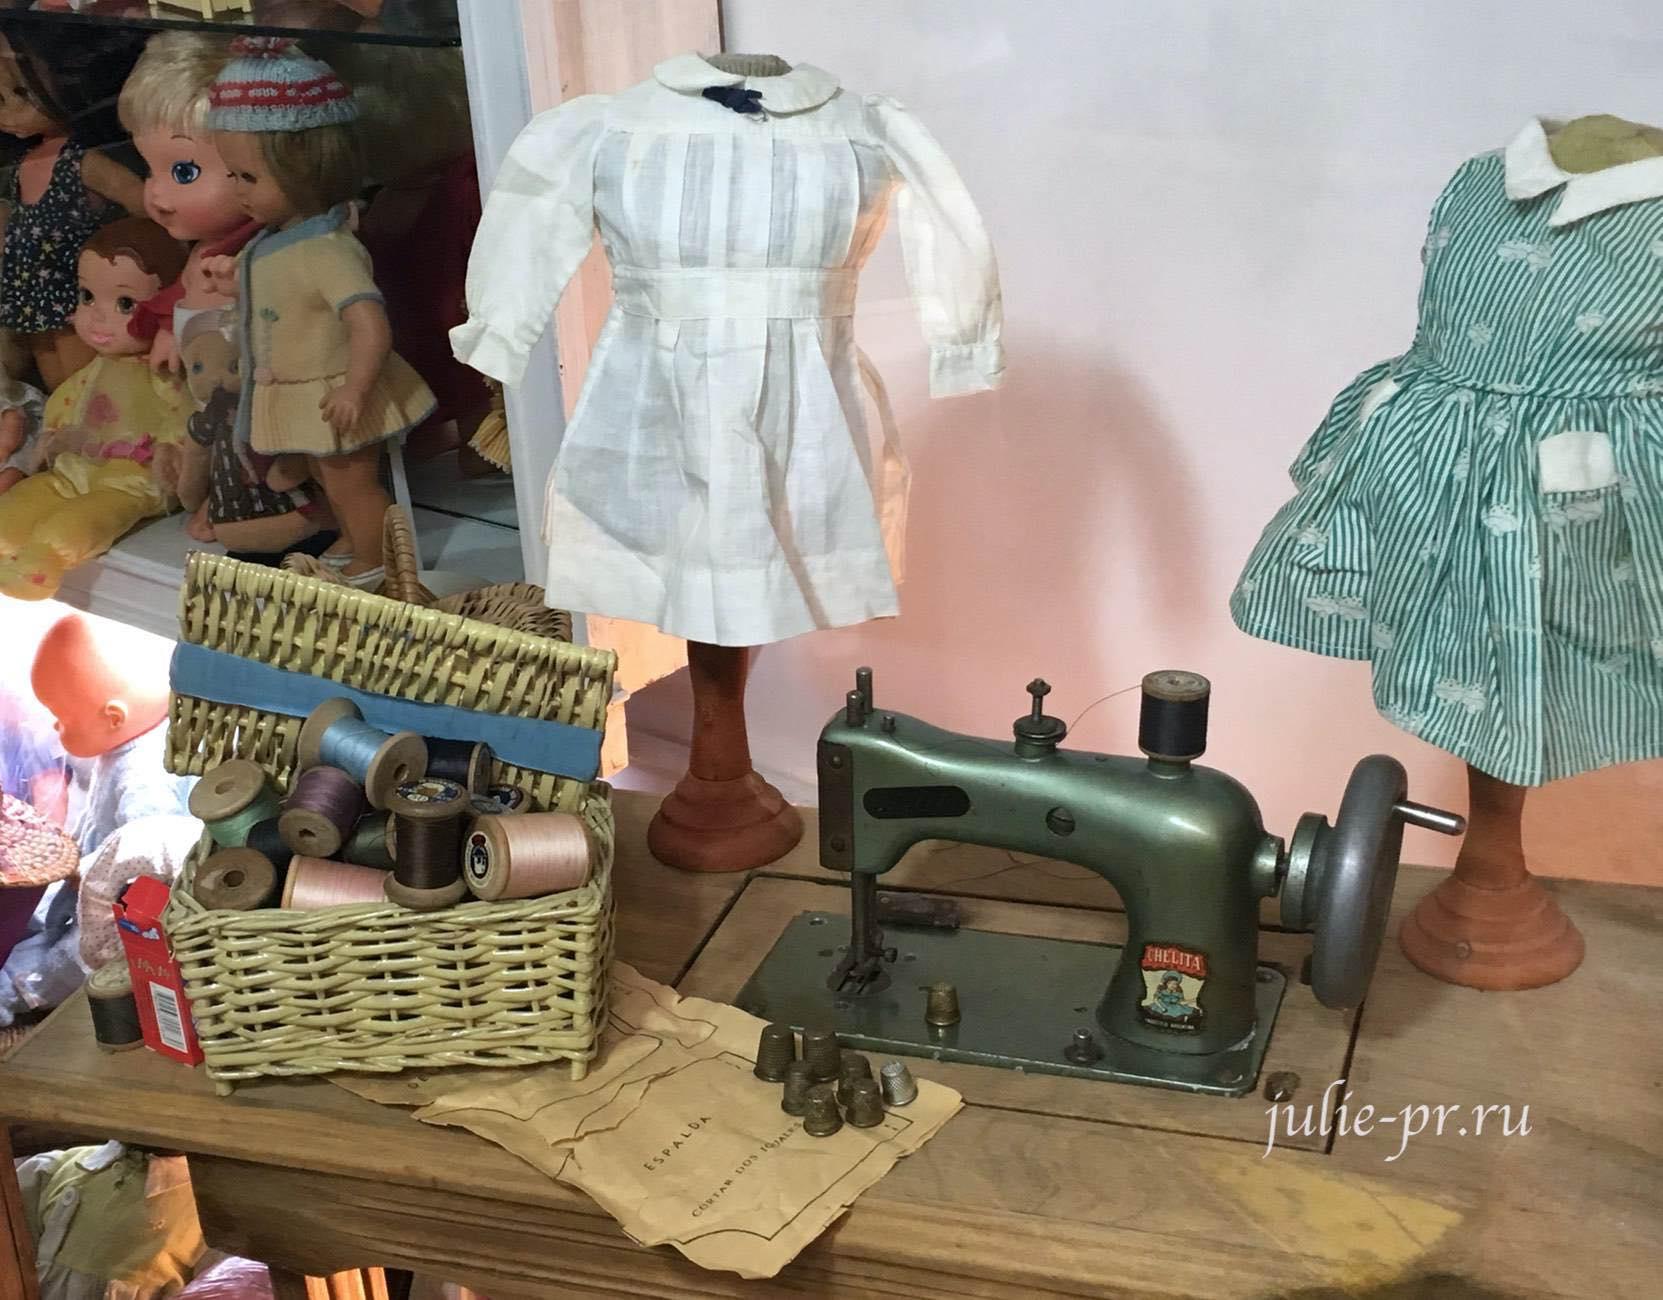 Аргентина, Буэнос-Айрес, рынок Сан-Тельмо, антиквариат, напёрстки, швейная машина